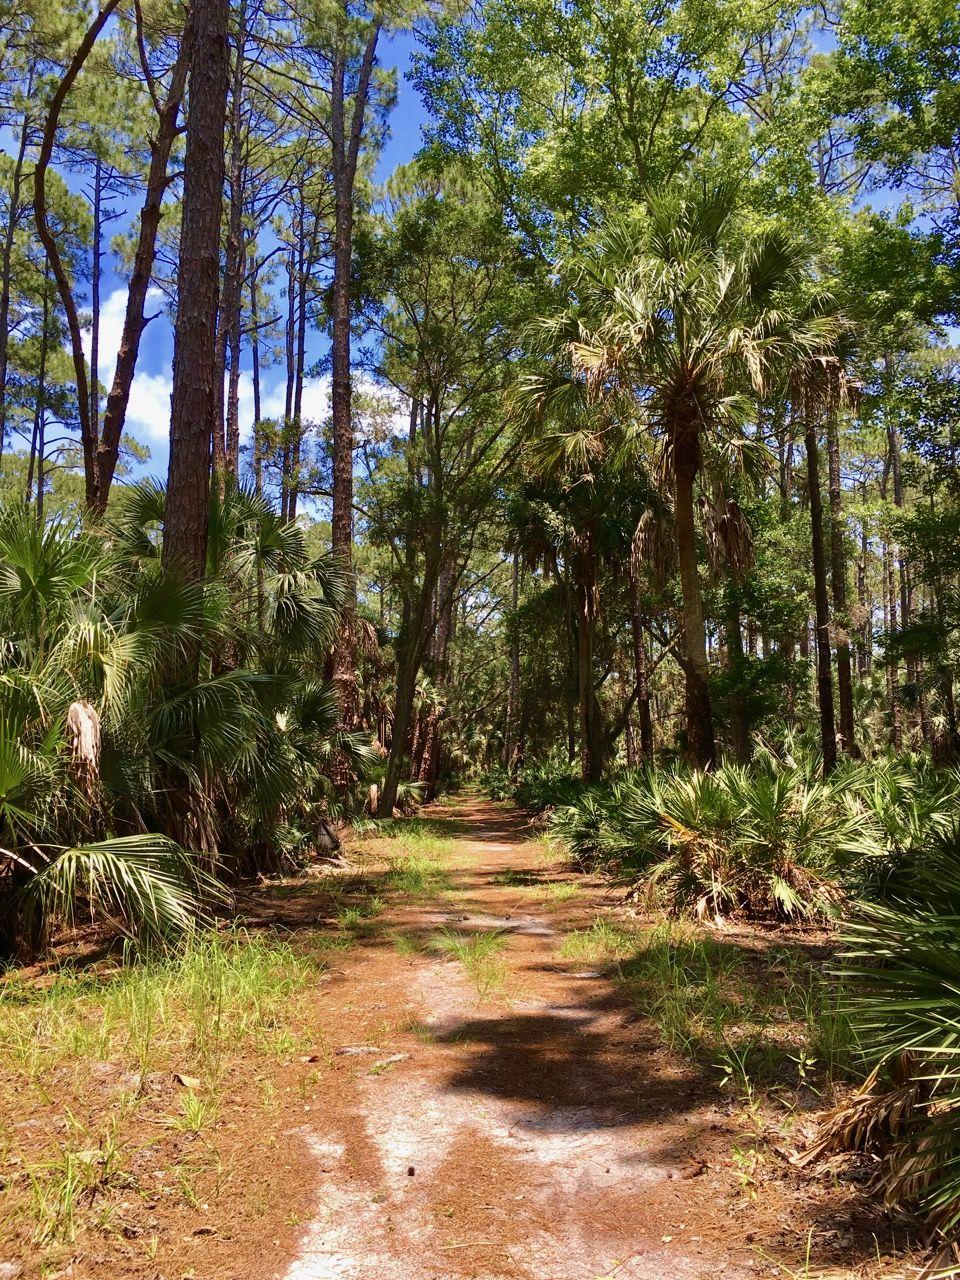 Hiking at bulow creek florida state parks palm islands